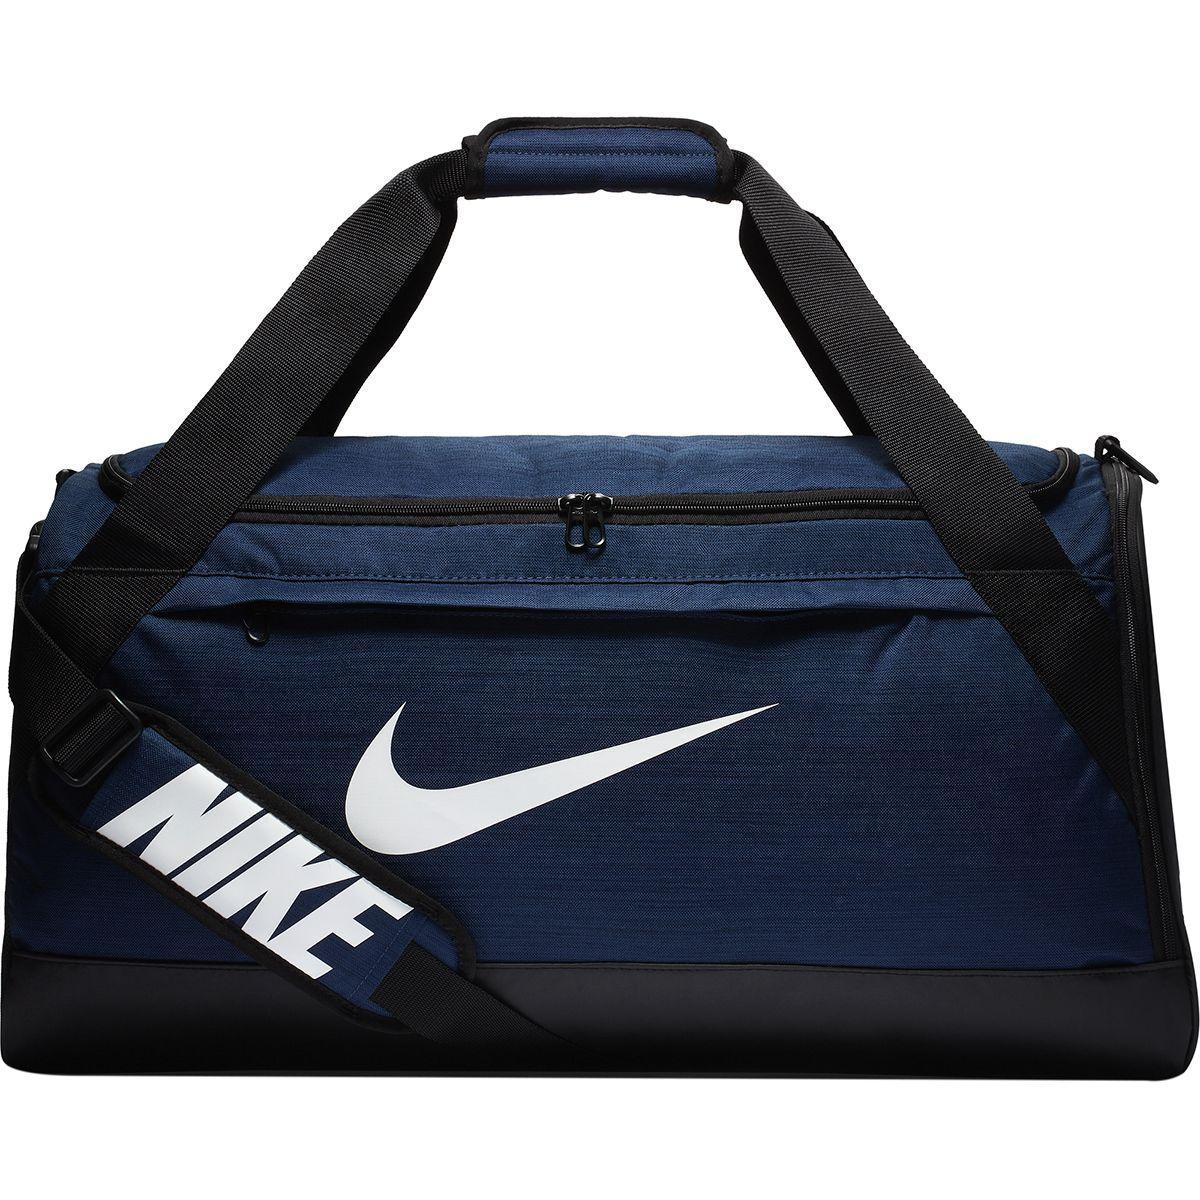 0b2d84280f Lyst - Nike Brasilia Medium Duffel in Blue for Men - Save 11%